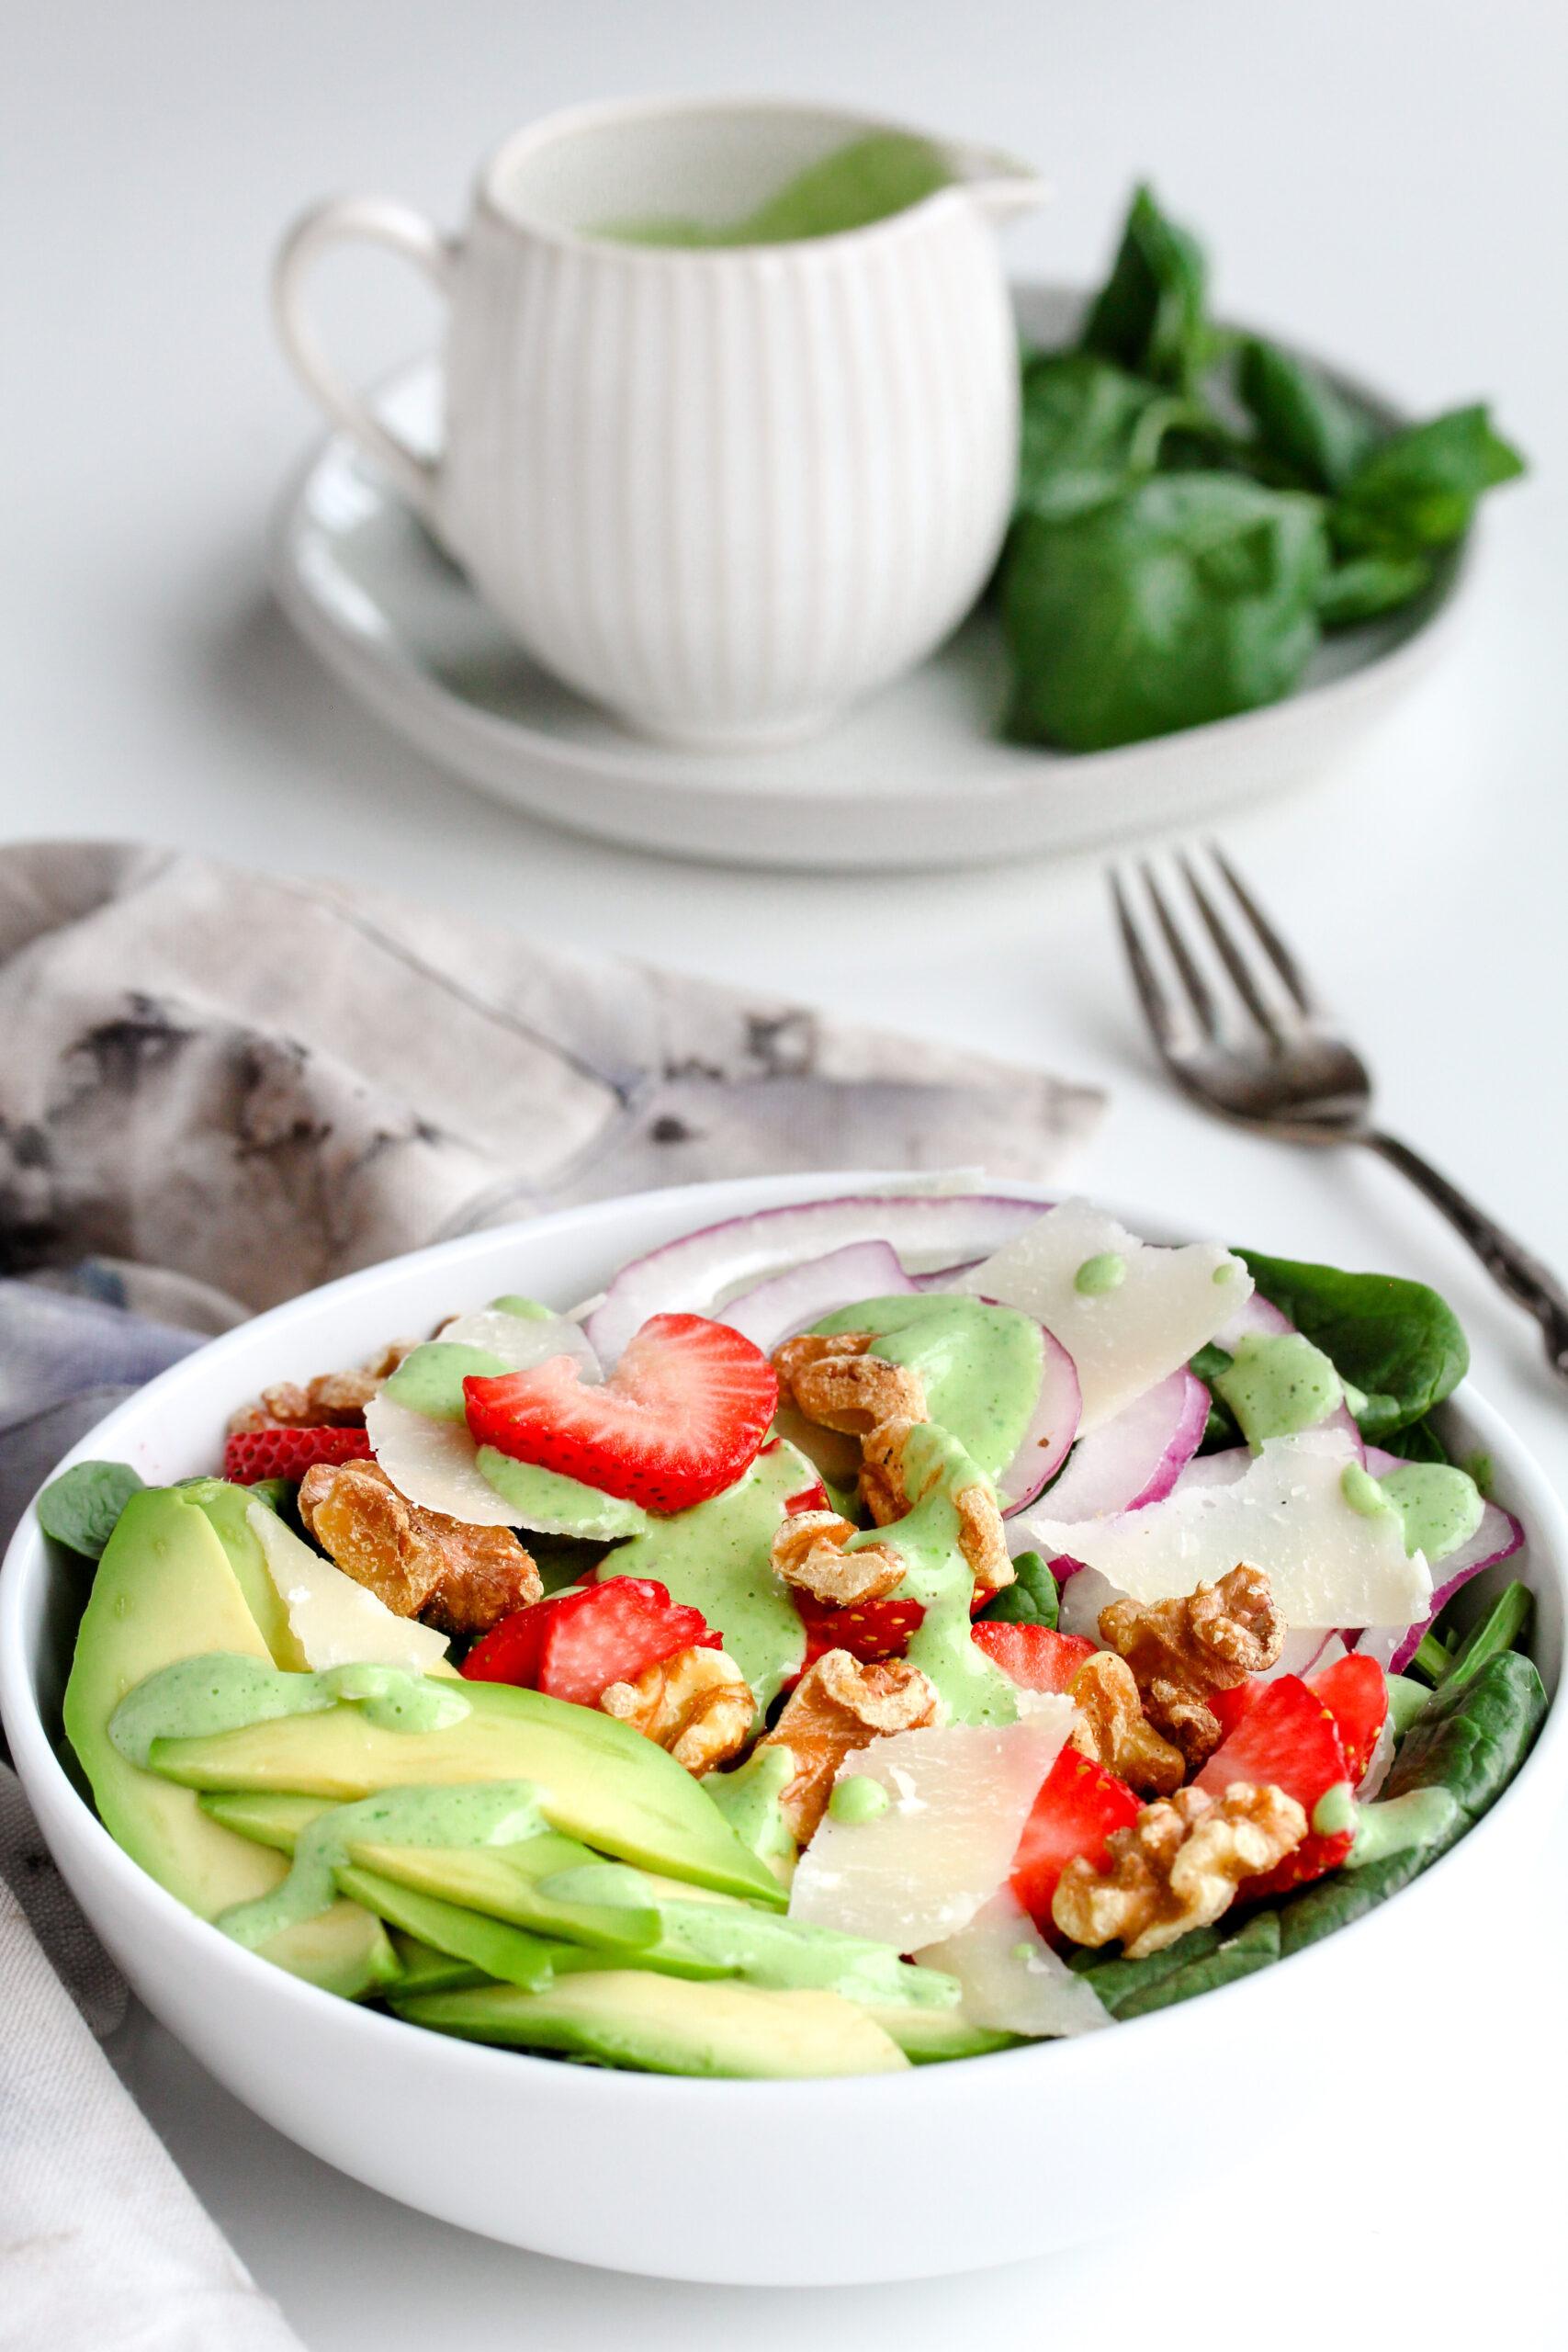 Spinach Salad with Basil Buttermilk Dressing | sarahaasrdn.com